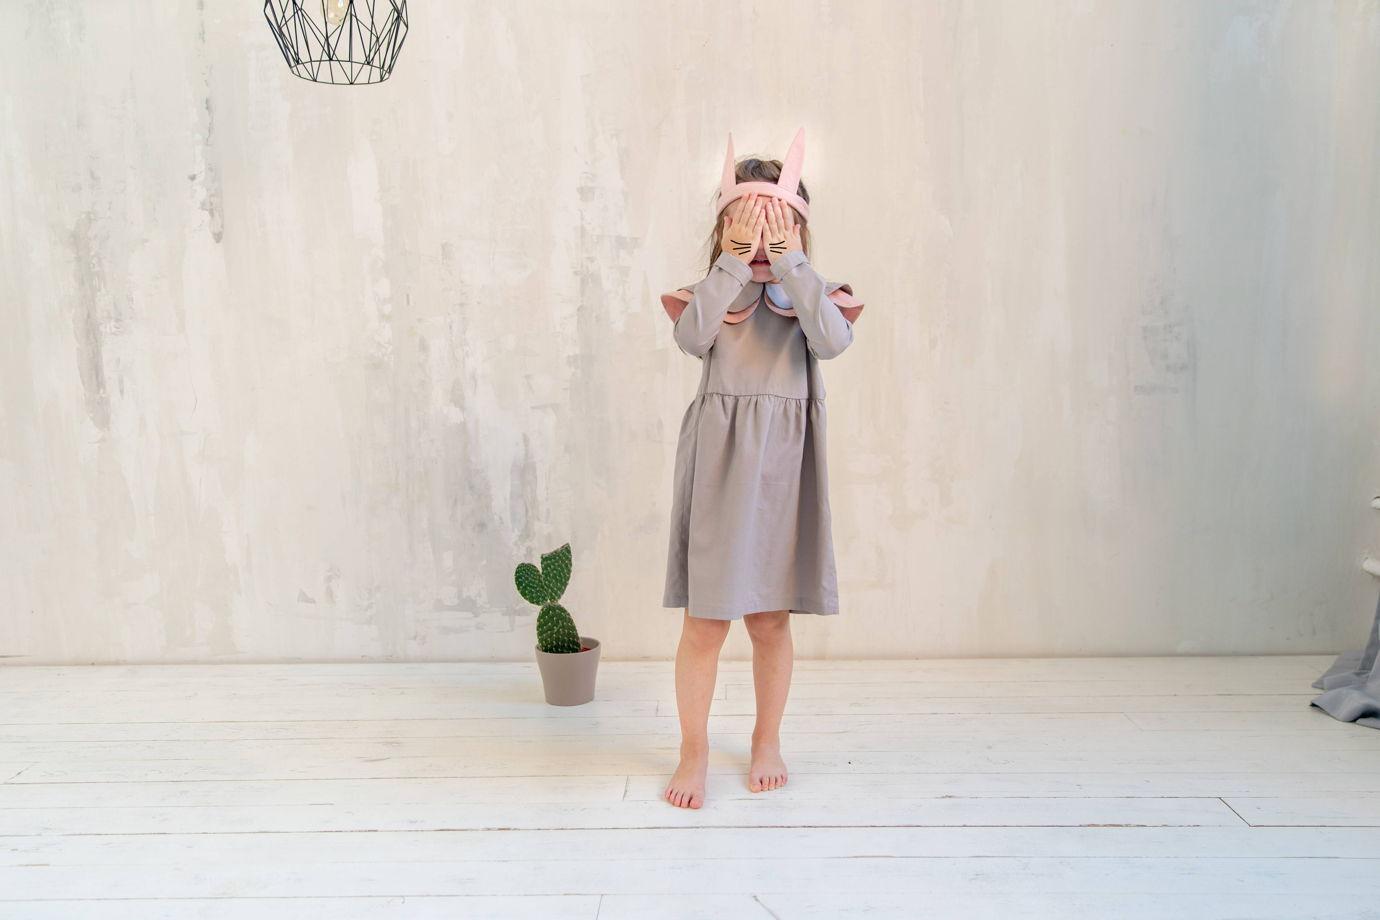 Повязка-ободок Зайка цвет розовый, серый